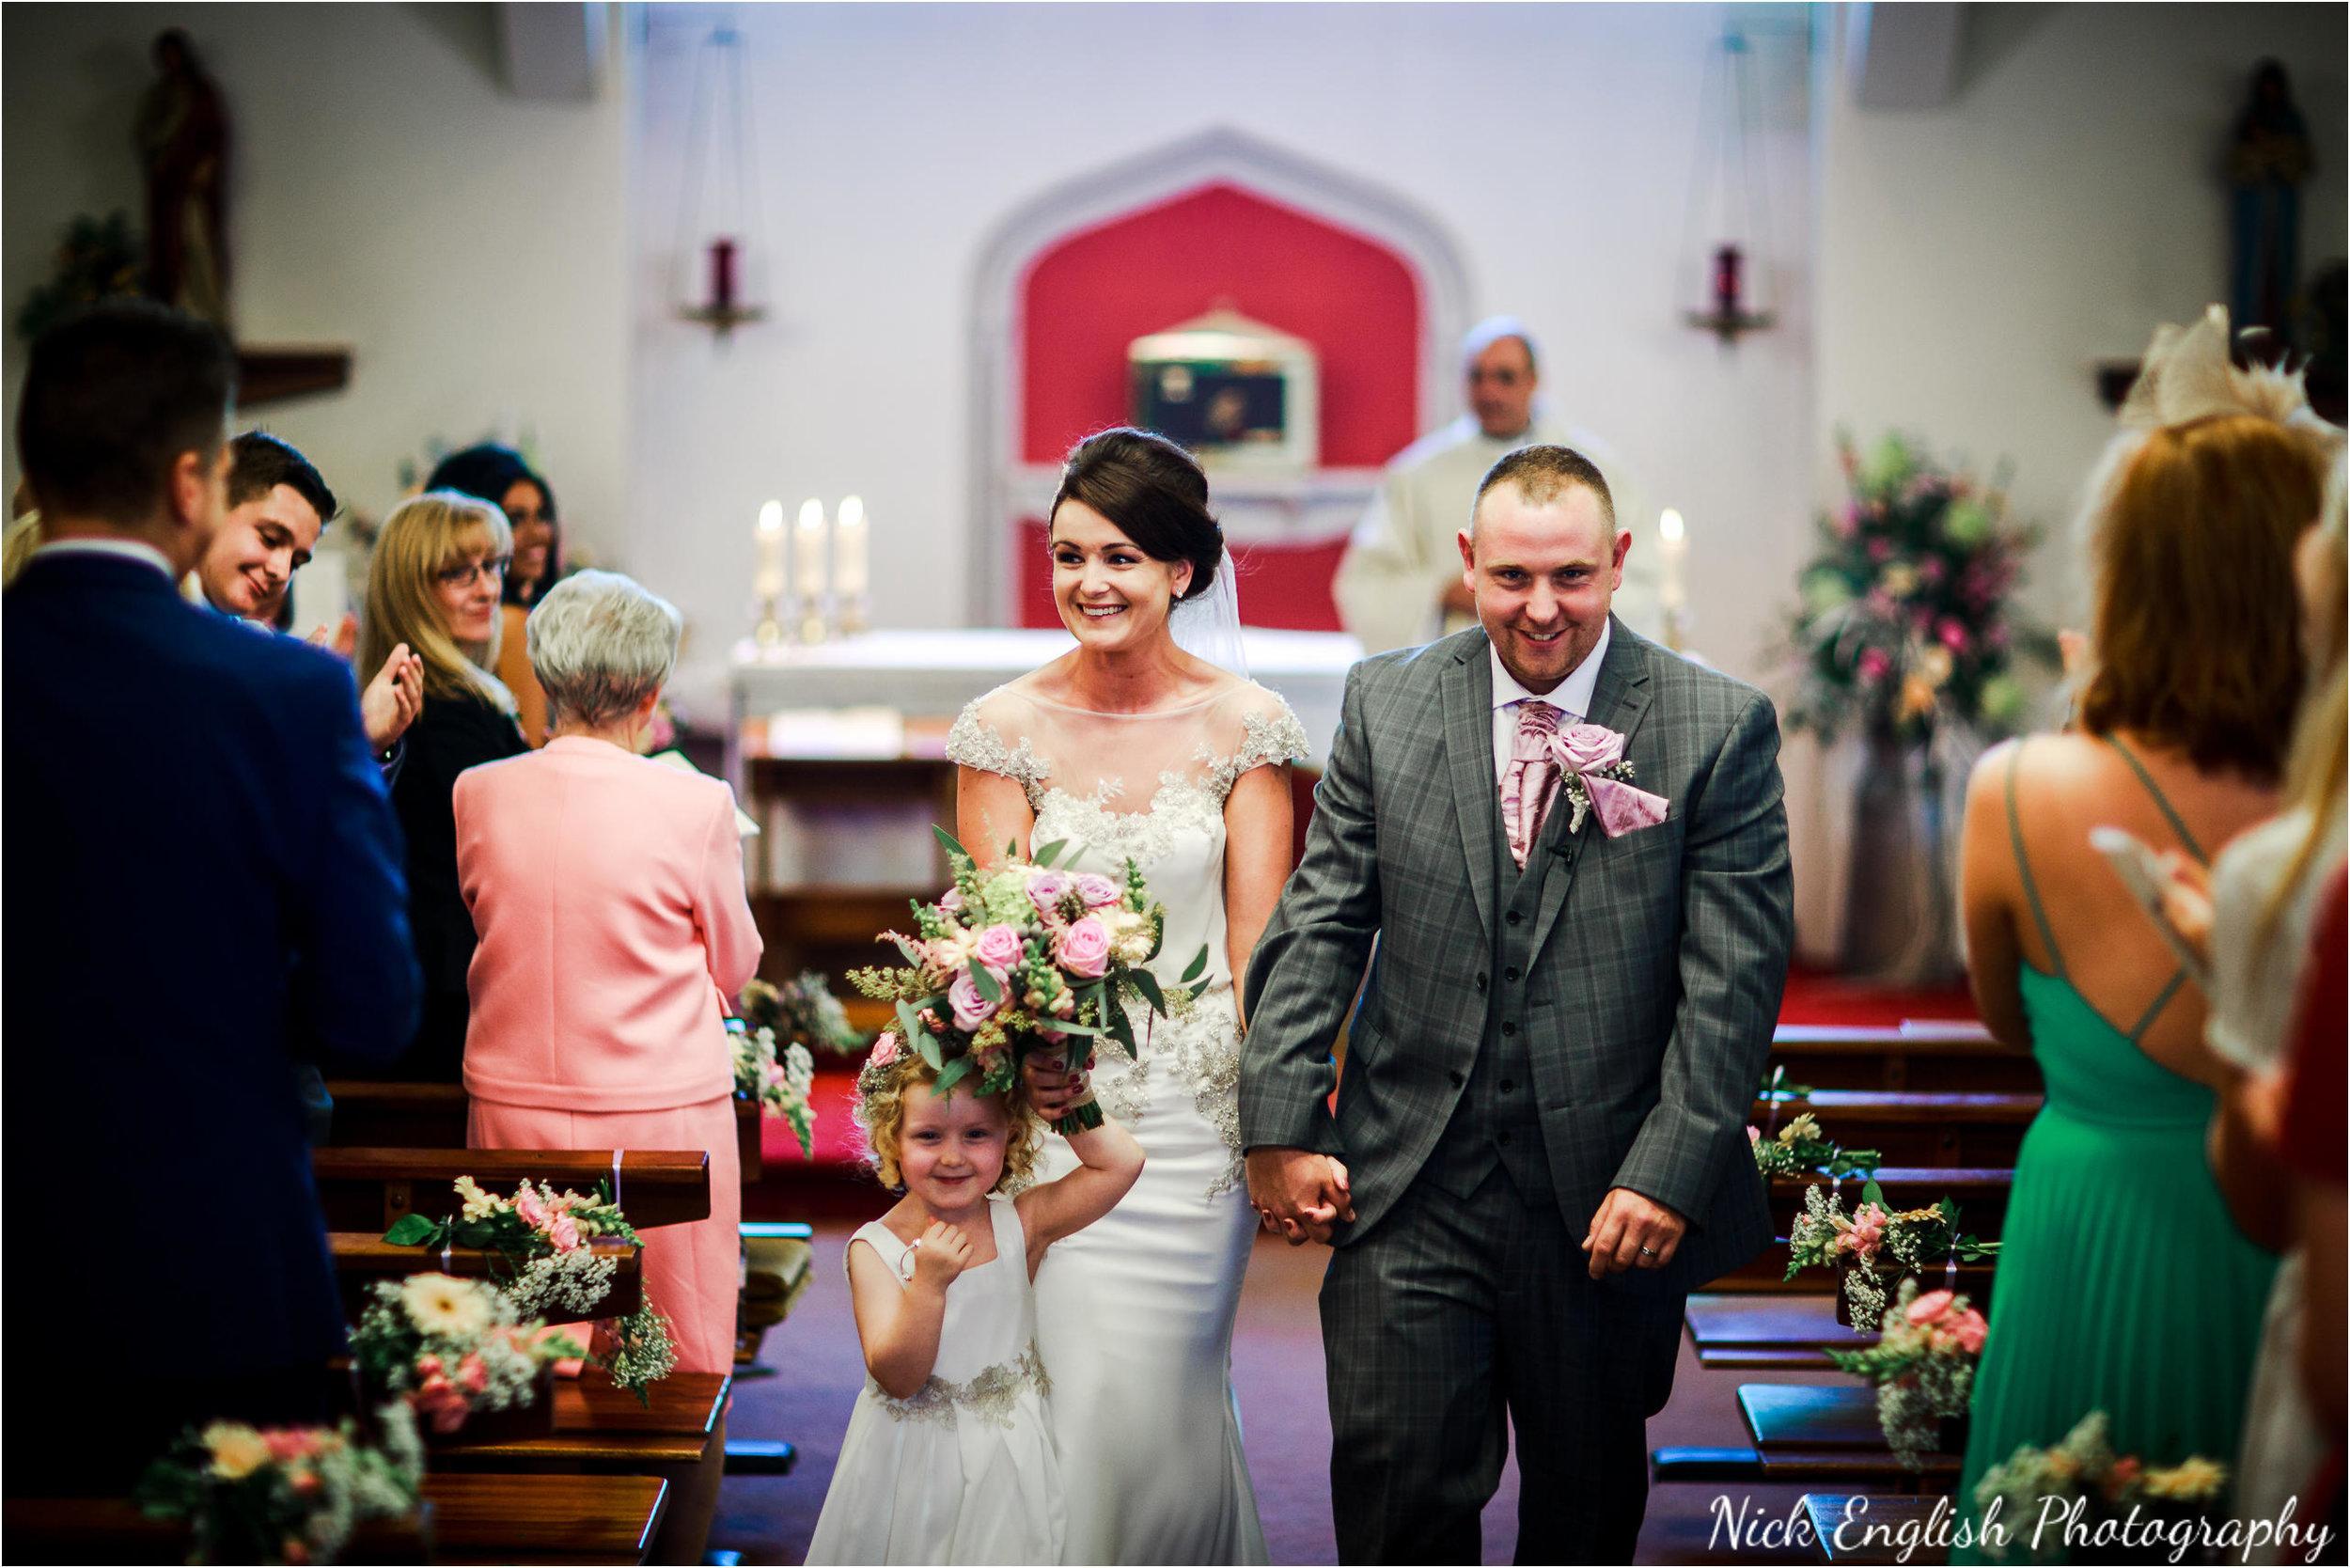 Stacey-Ash-Wedding-Photographs-Stanley-House-Preston-Lancashire-82.jpg